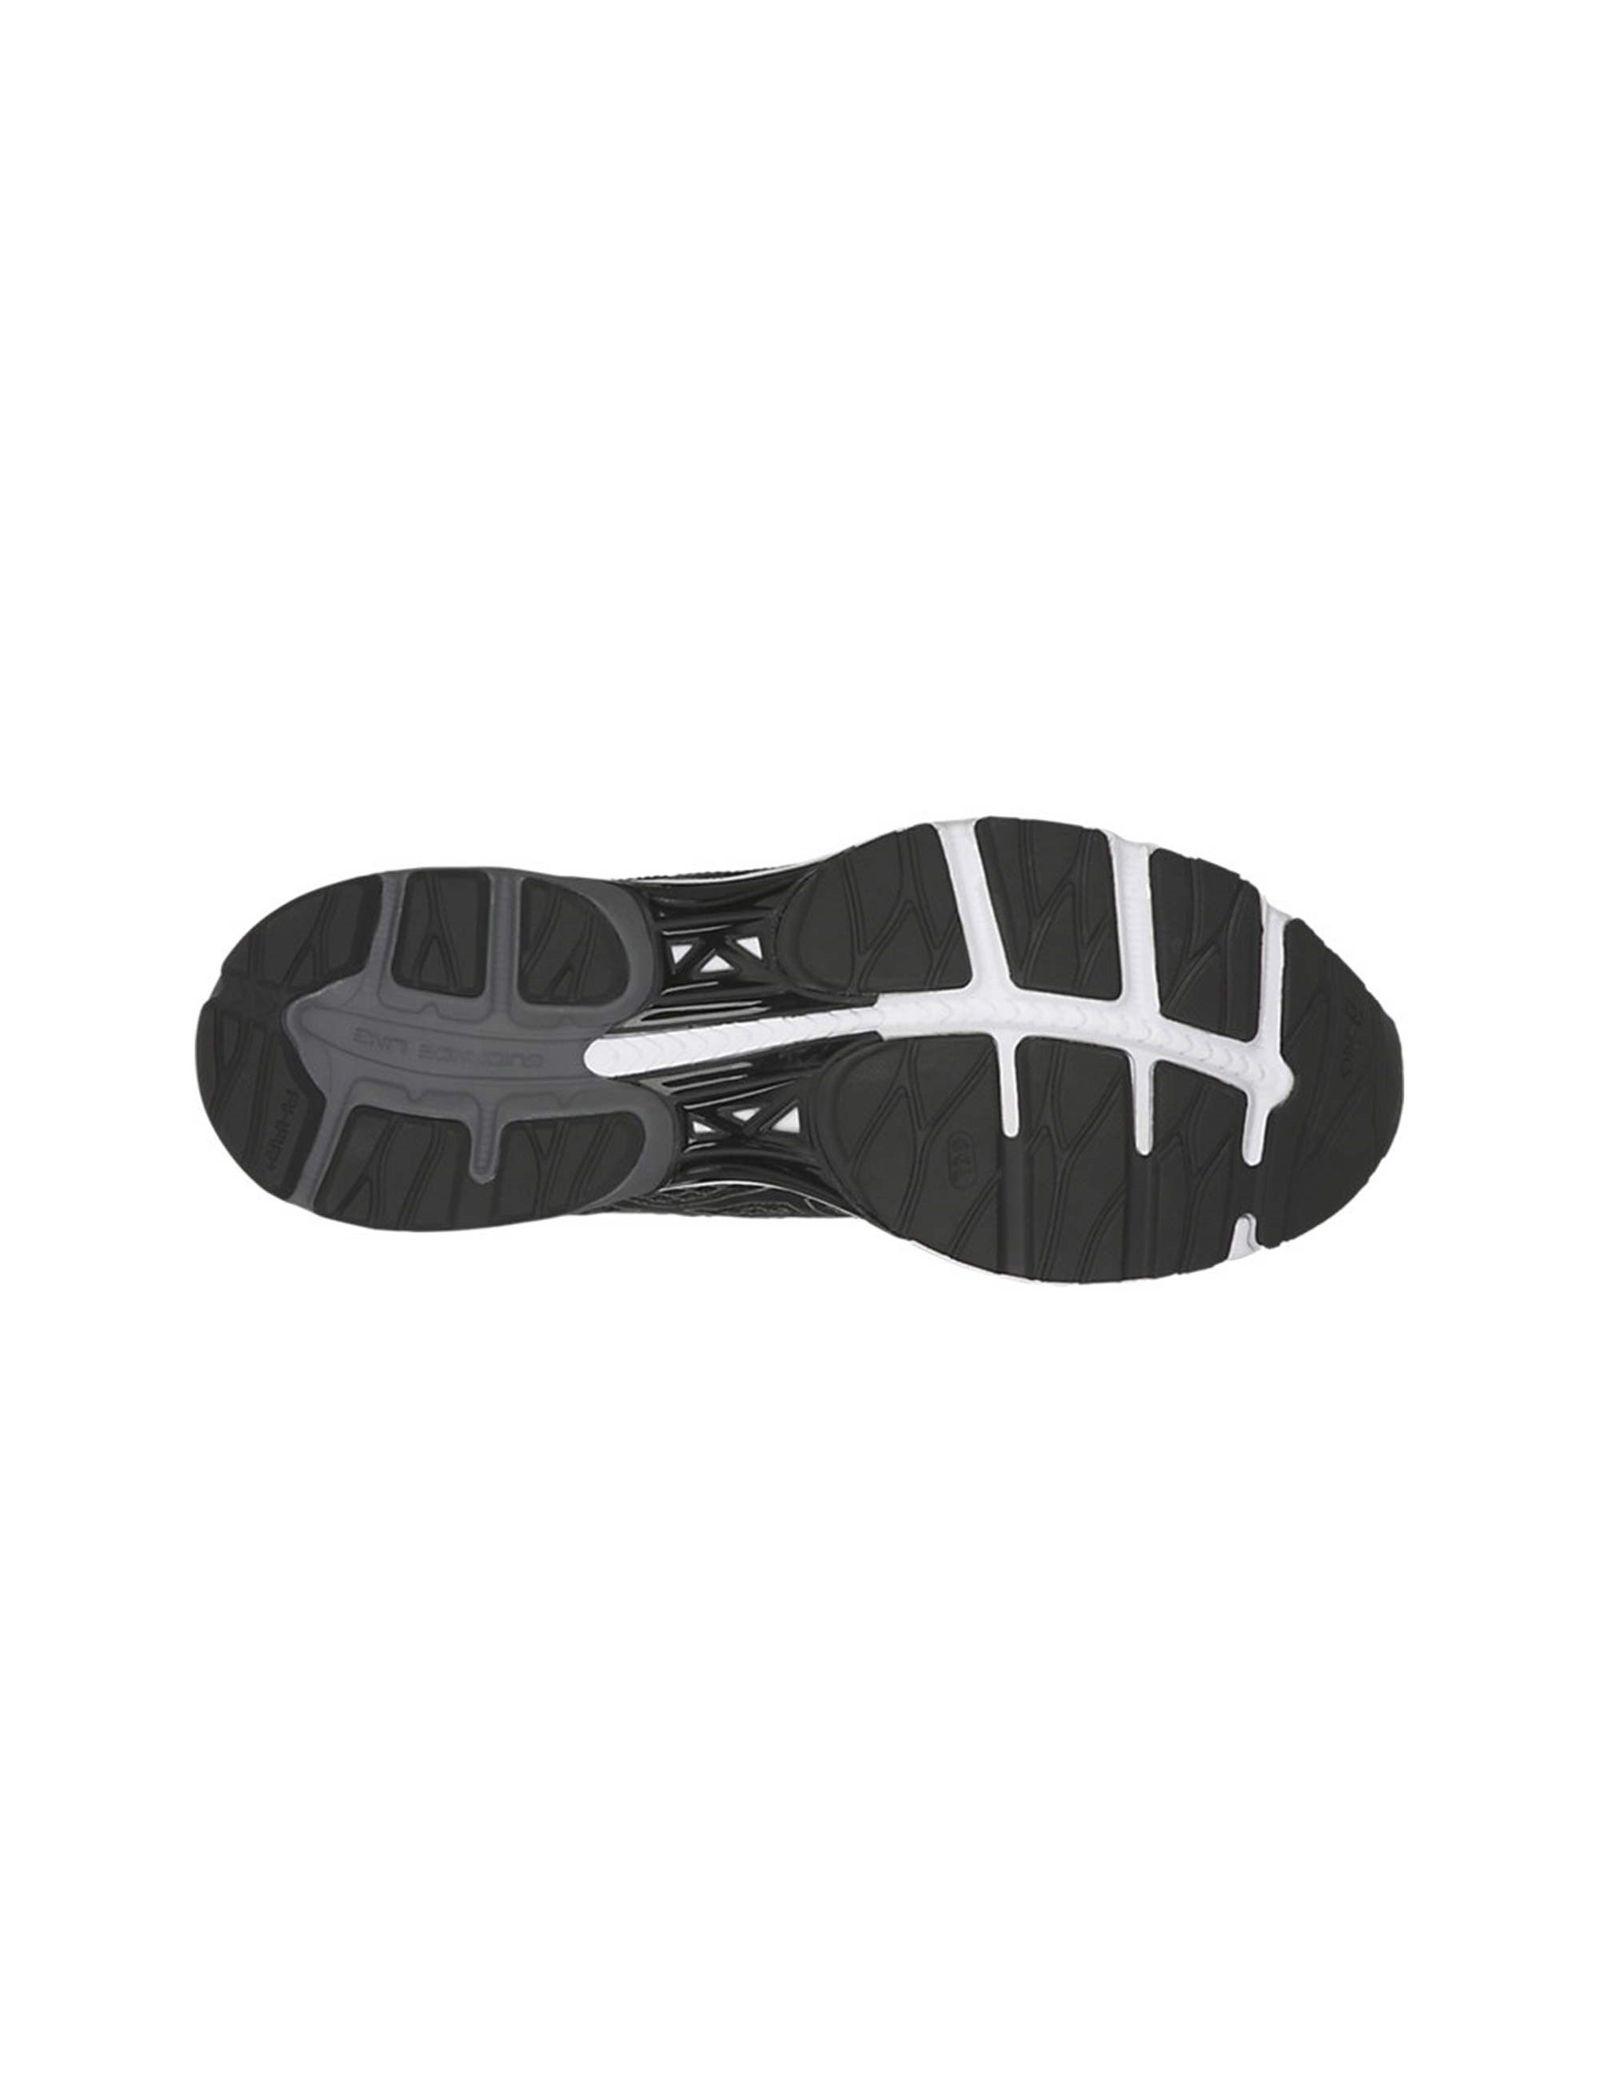 کفش دویدن بندی مردانه GEL-FLUX 4 - اسیکس - مشکي - 3